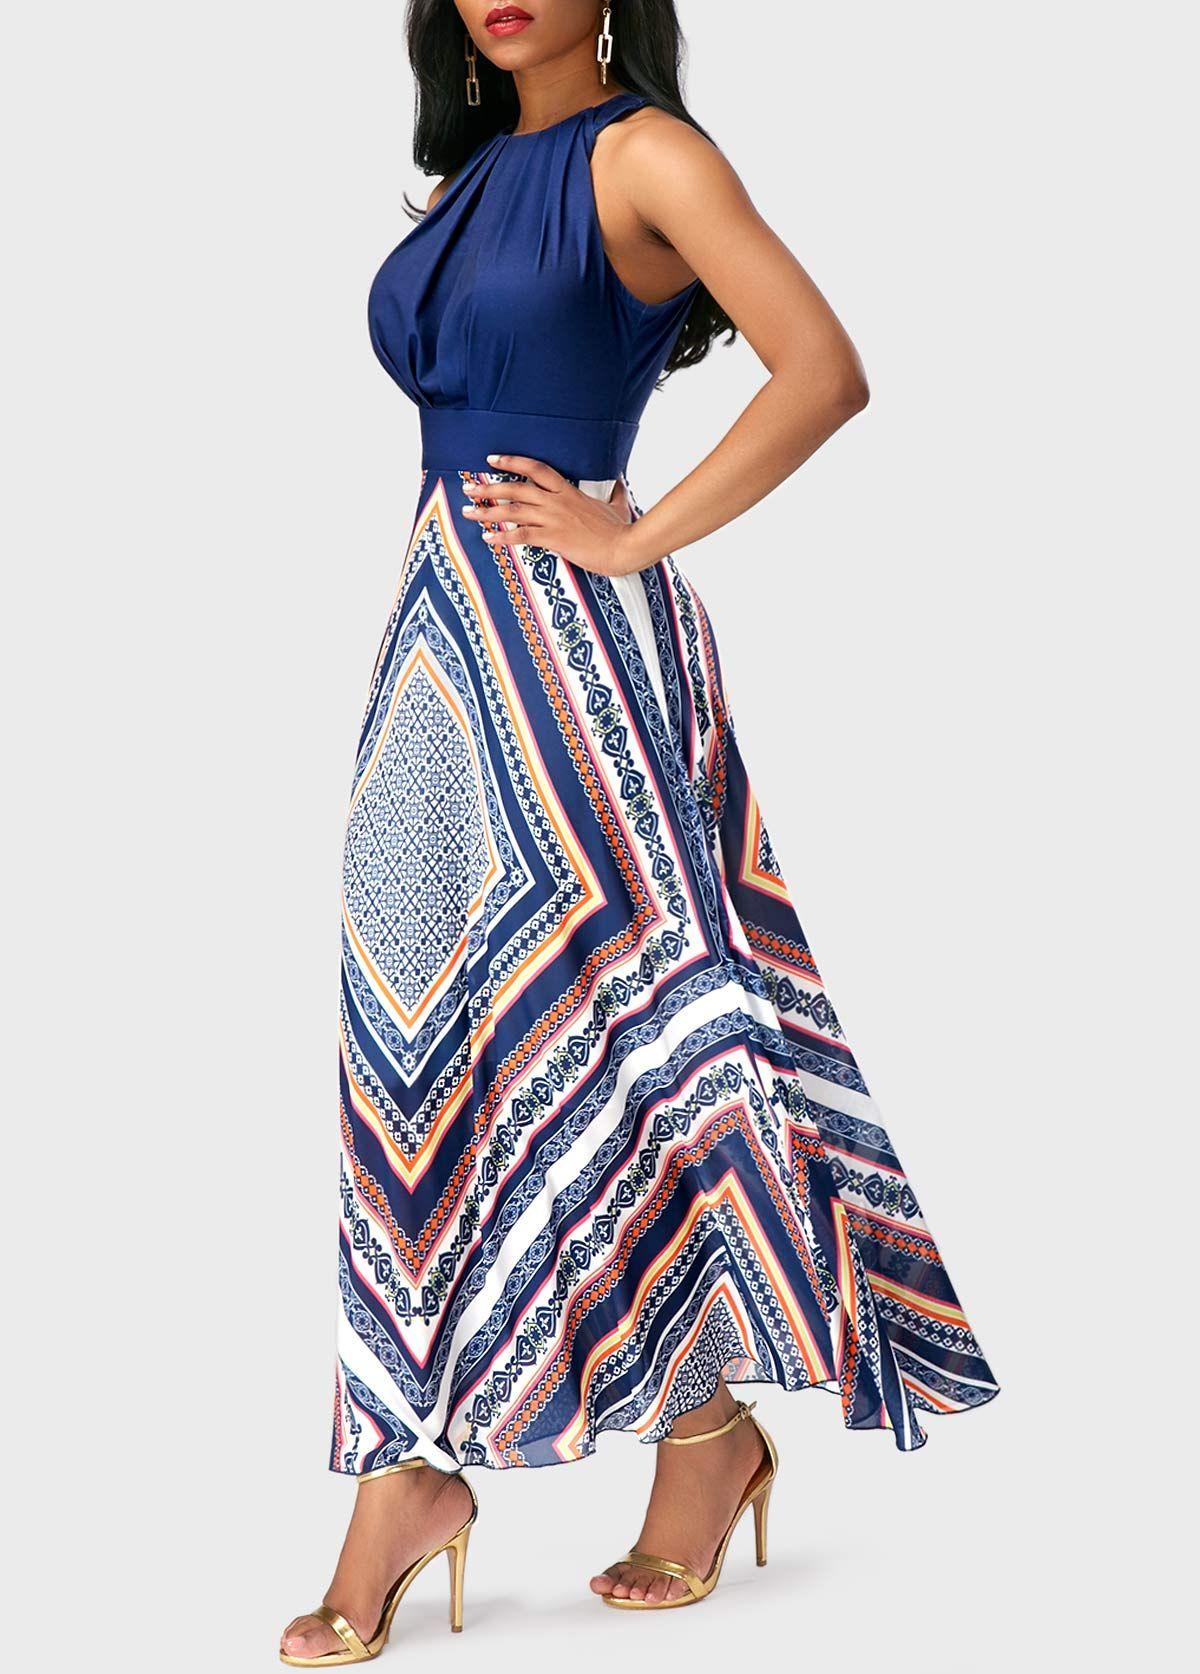 b6702dc08140 Round Neck Sleeveless Patchwork Printed Dress